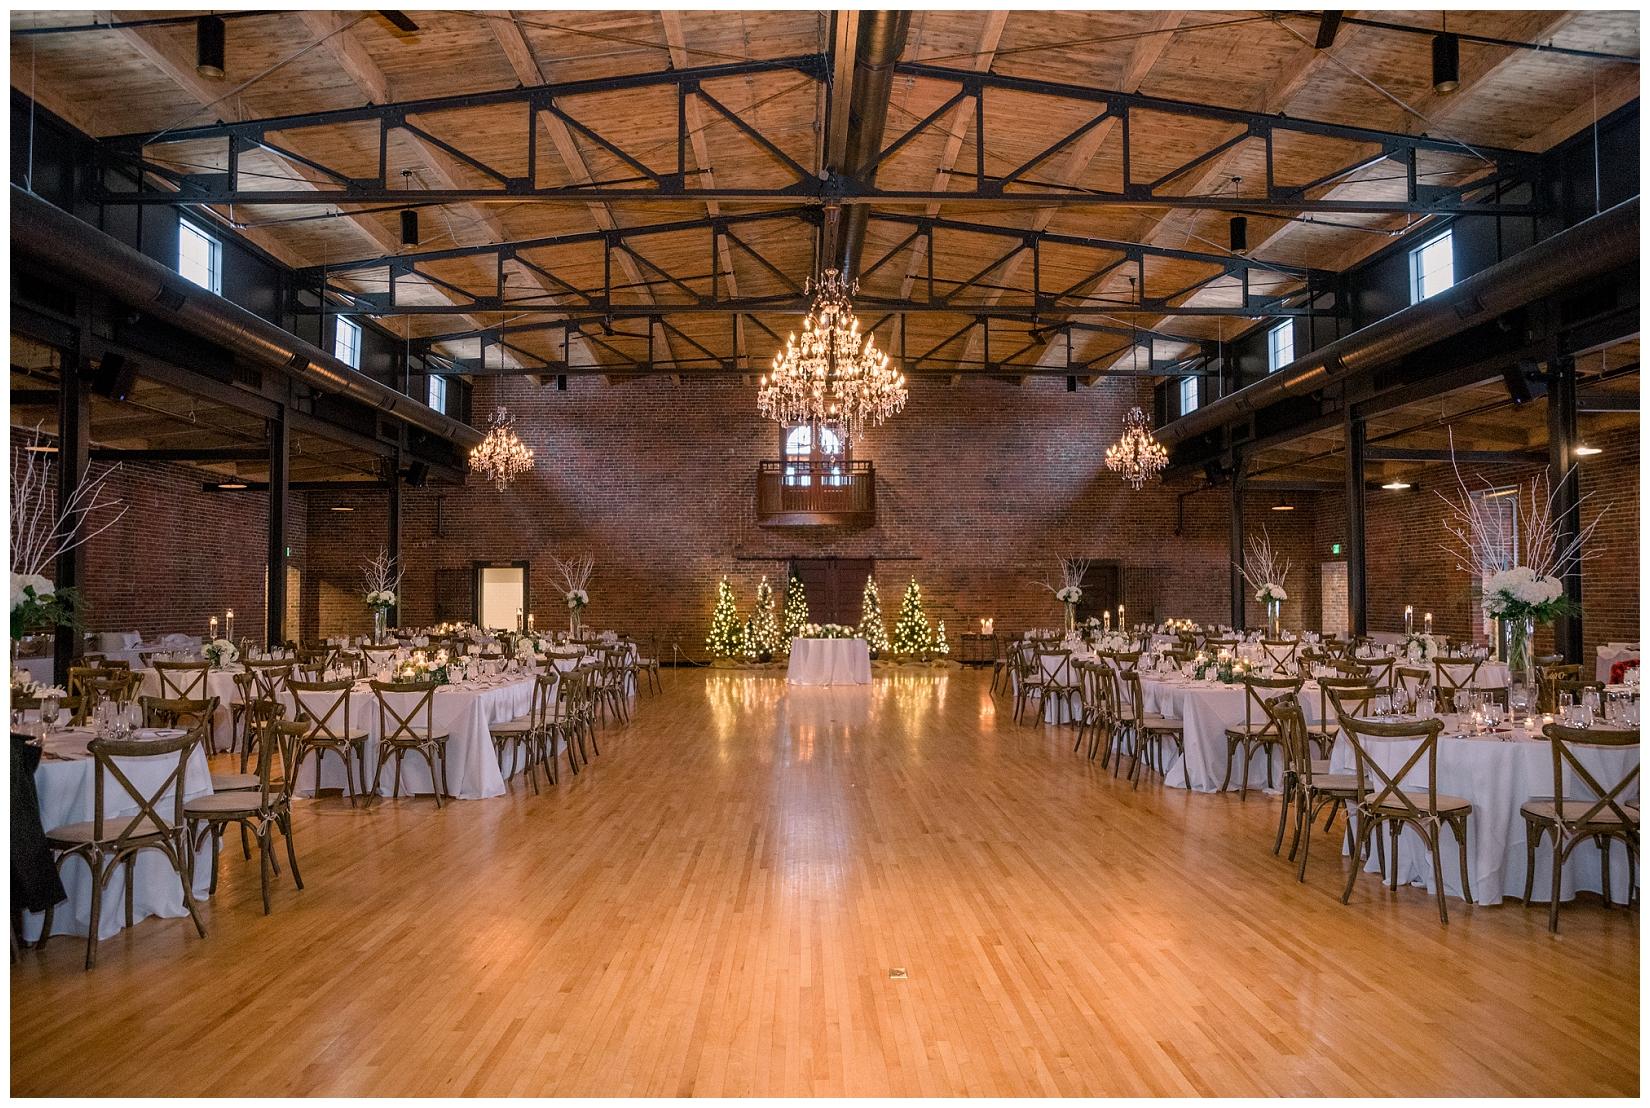 cat-alkire-wedding-photographer-indiana-chicago-indianapolis-fort-wayne_0980.jpg